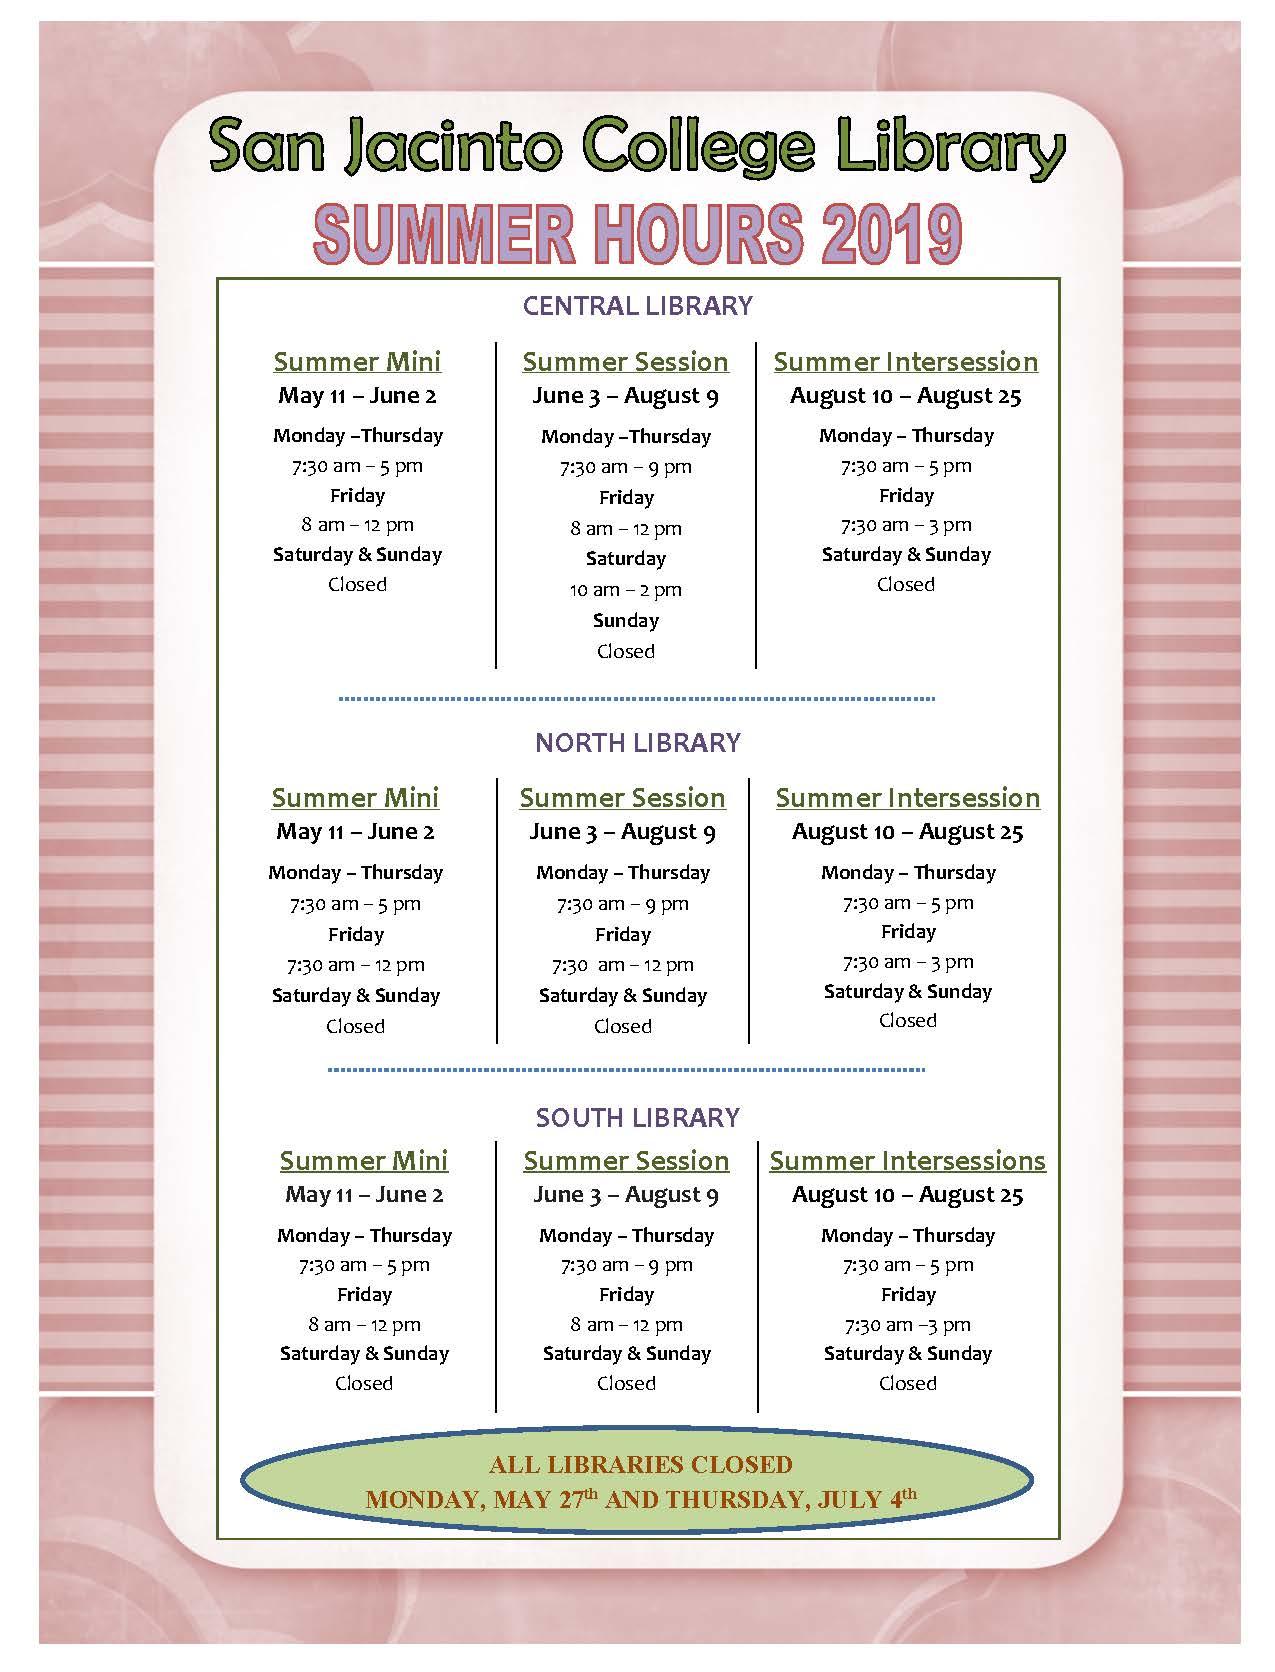 Summer 2019 Hours